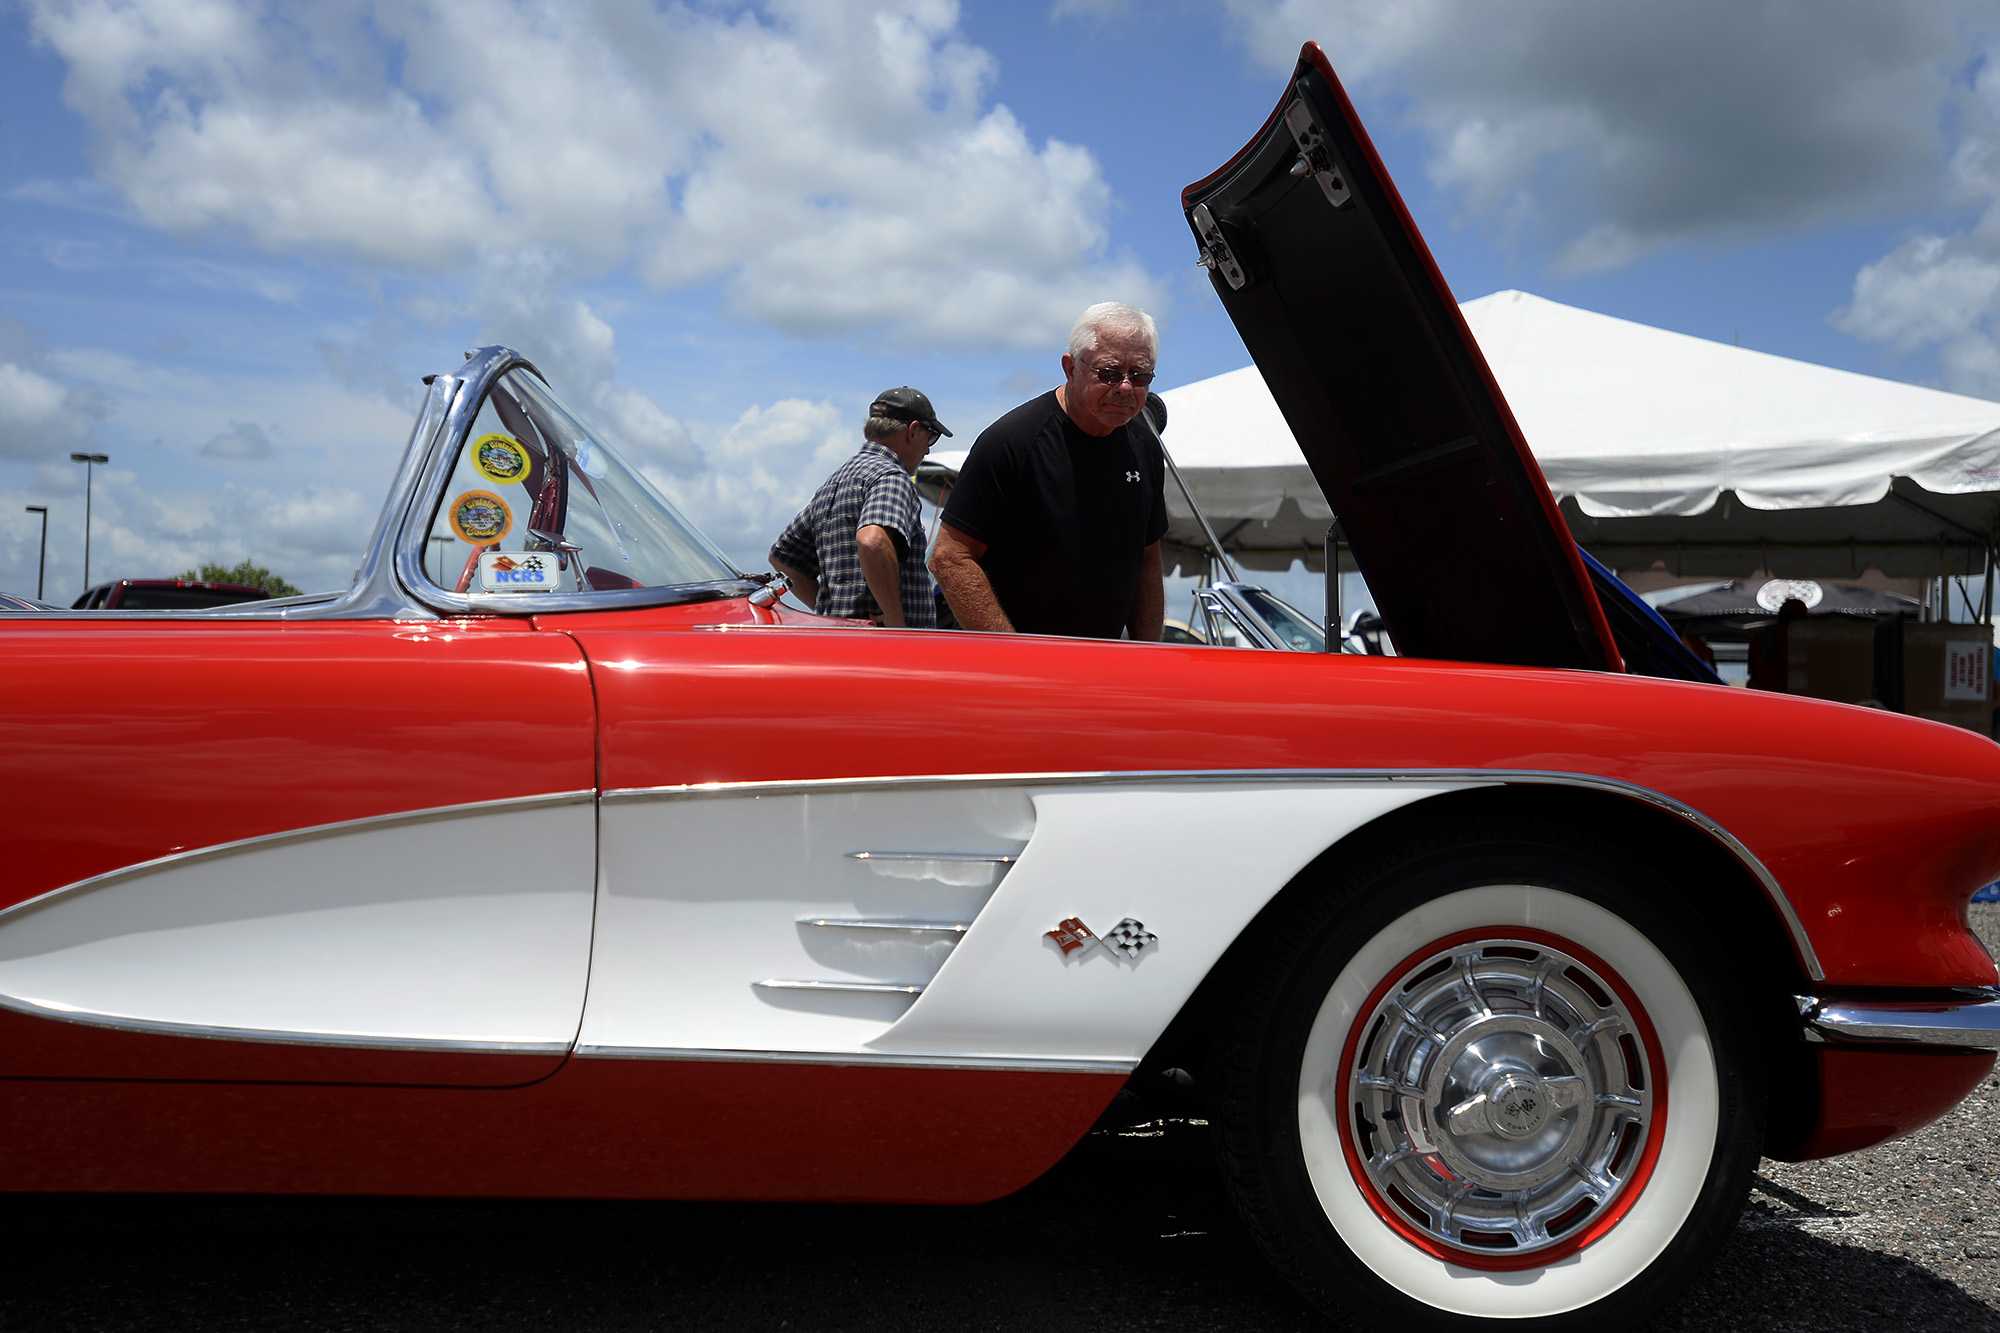 s Colorful Corvettes on display at car show Beaumont Enterprise